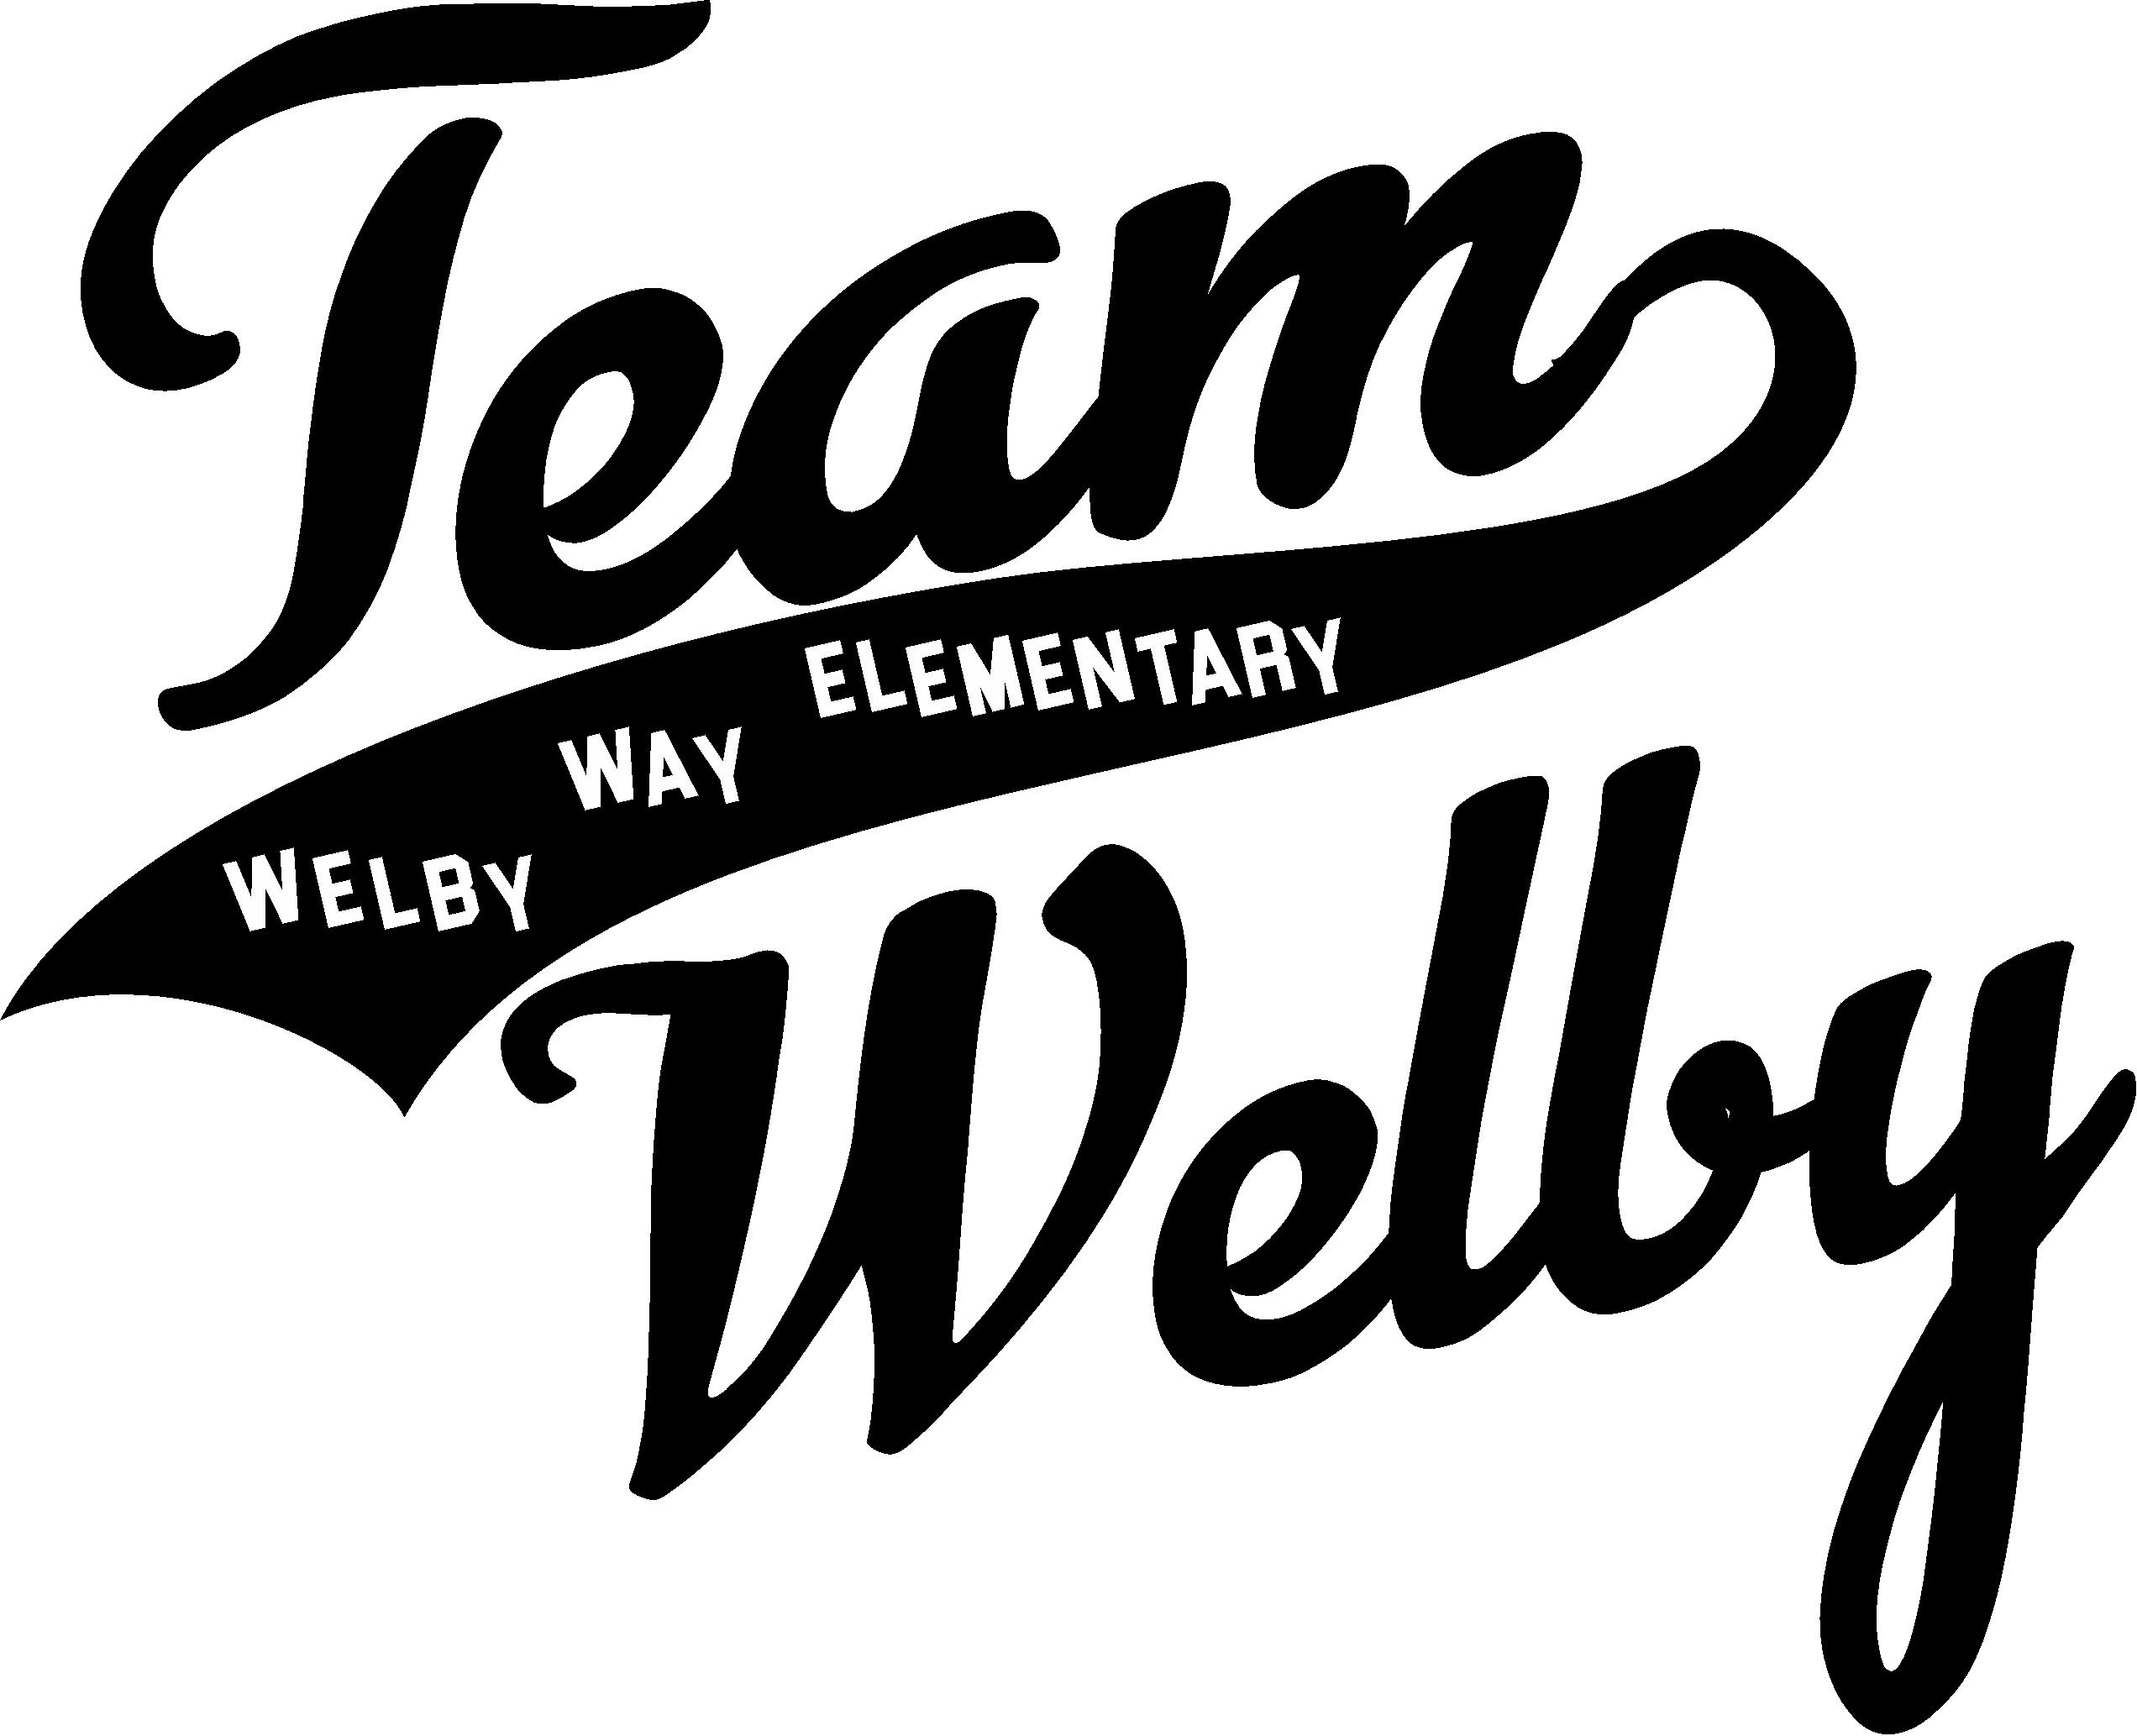 Welby Way Elementary